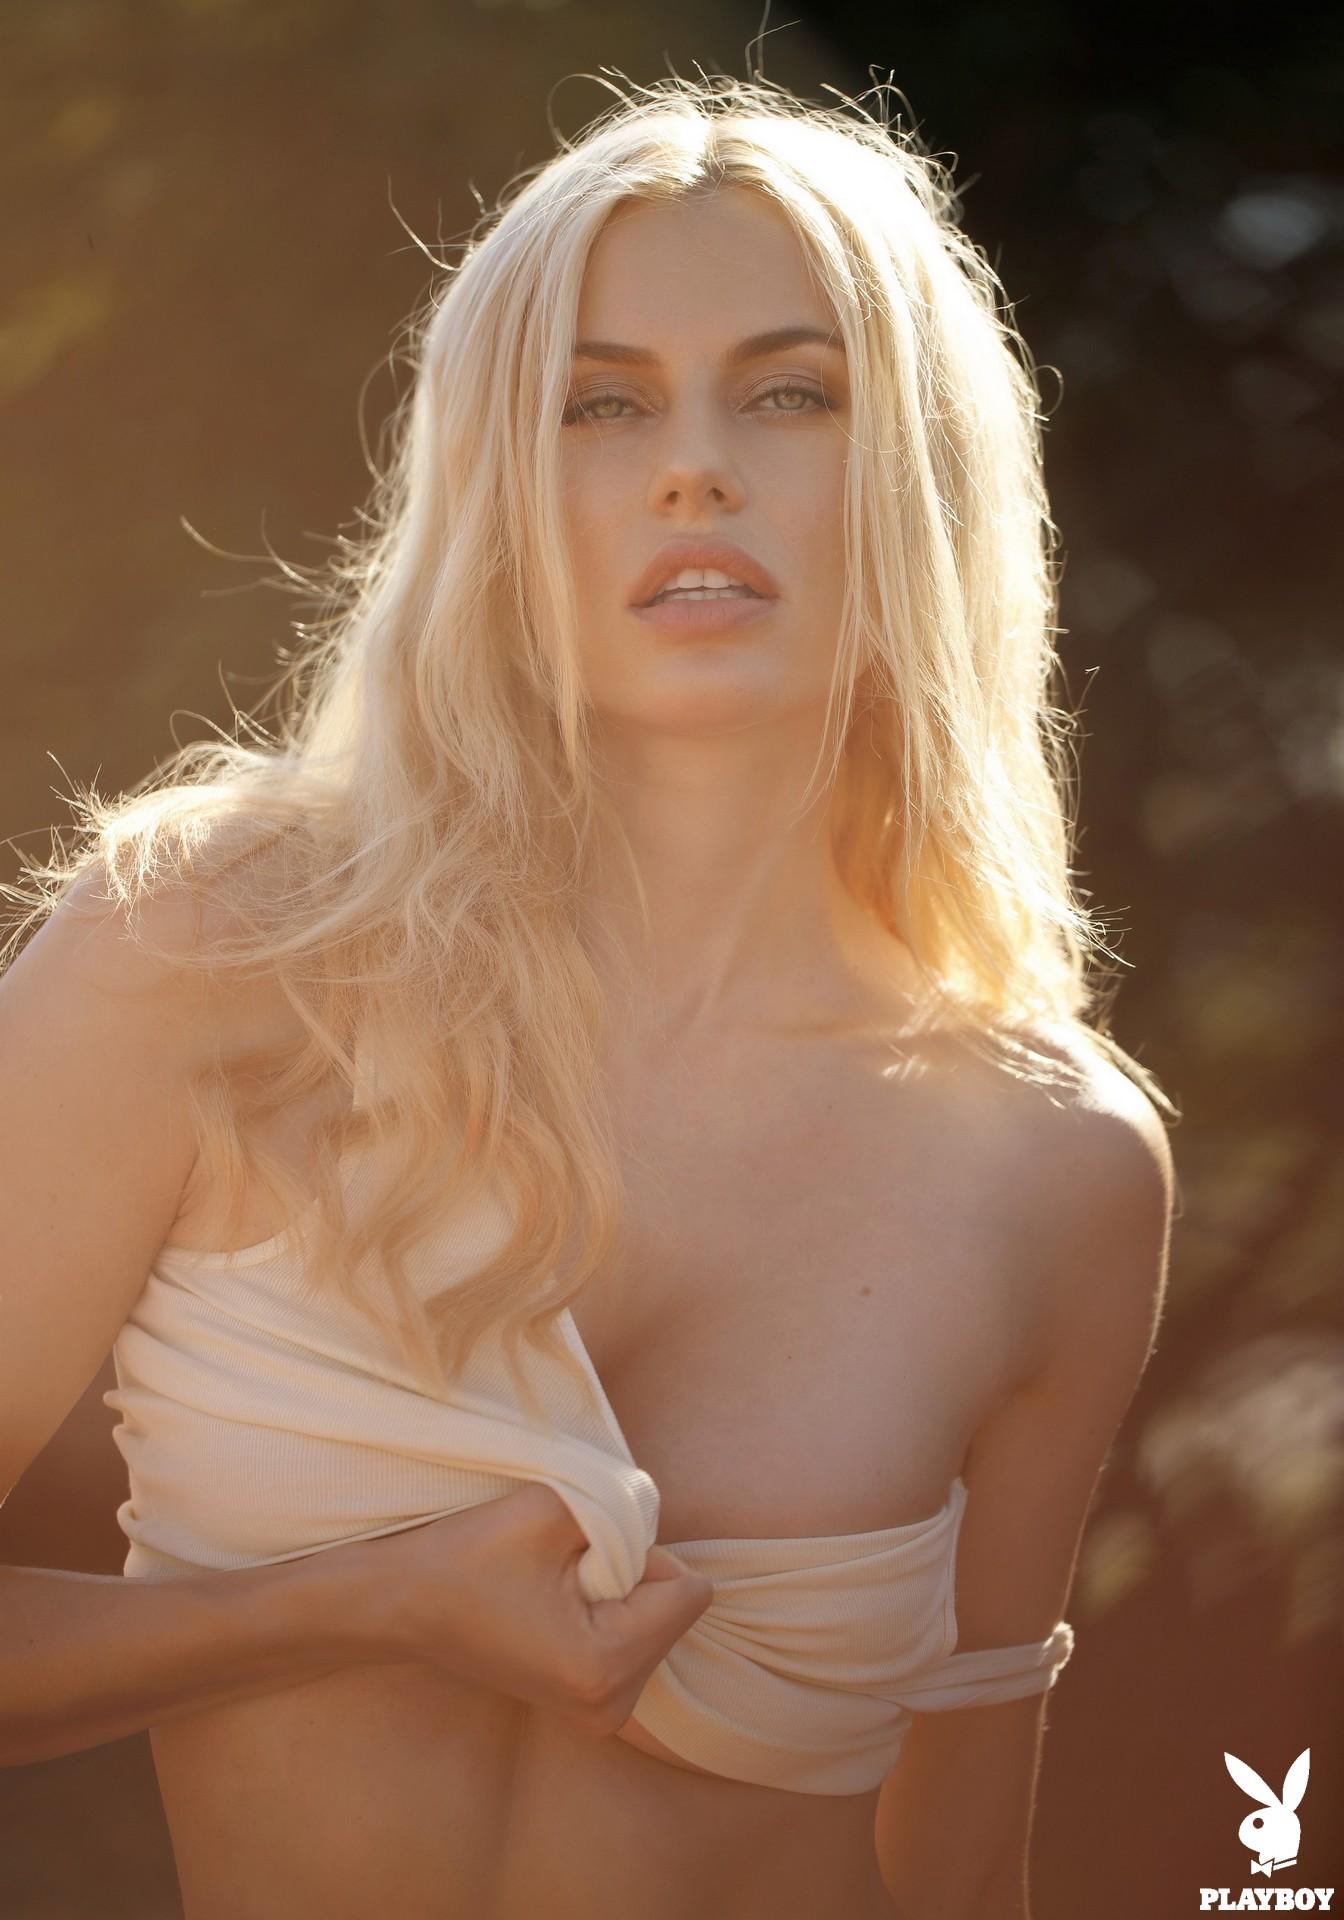 Playmate October 2018: Olga De Mar – Playboy Plus -